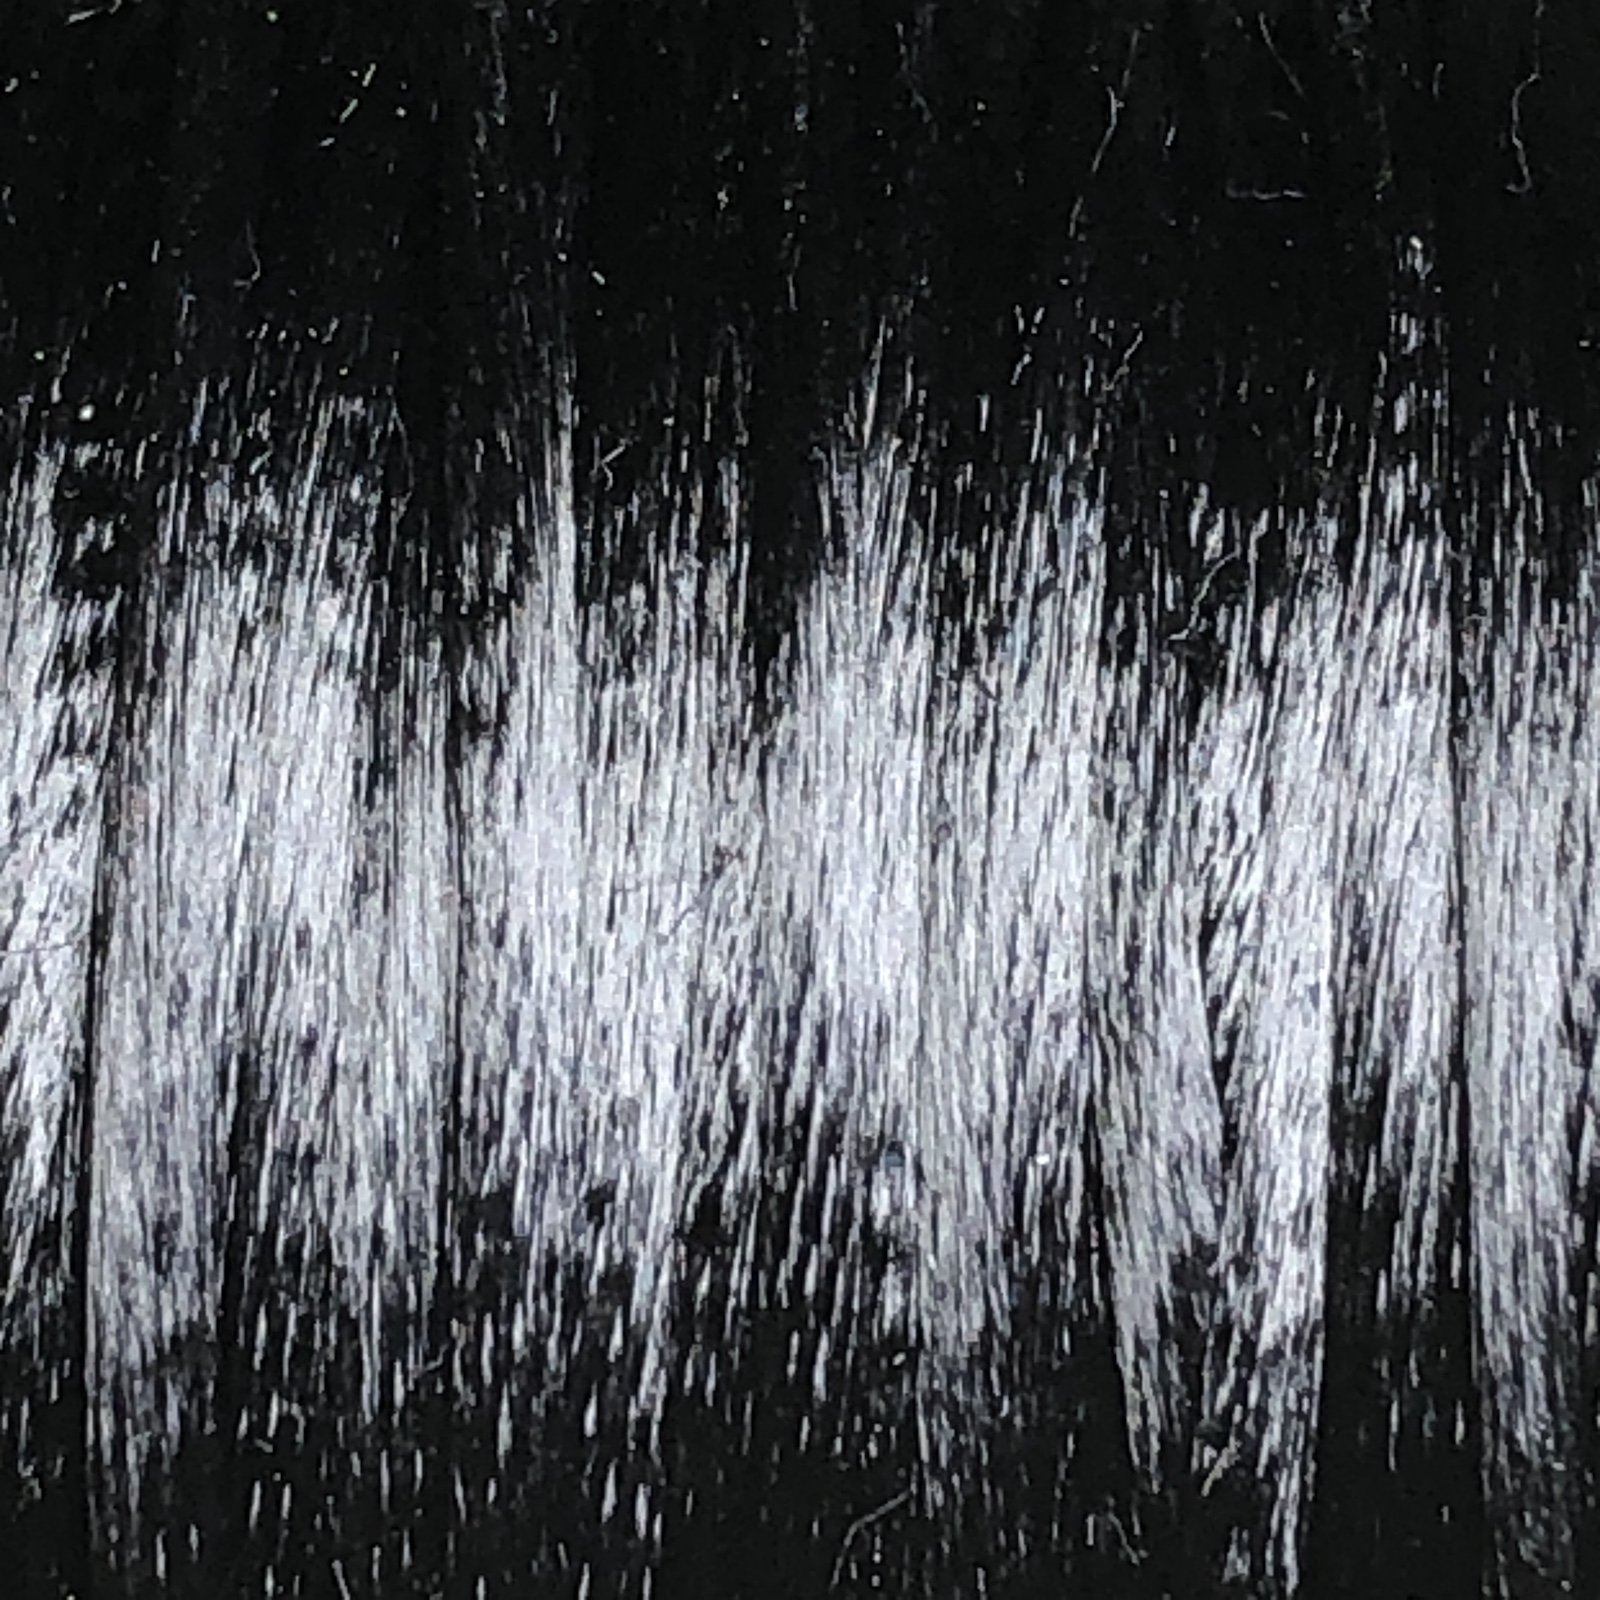 1mm Satin Cord Black 72yd spool